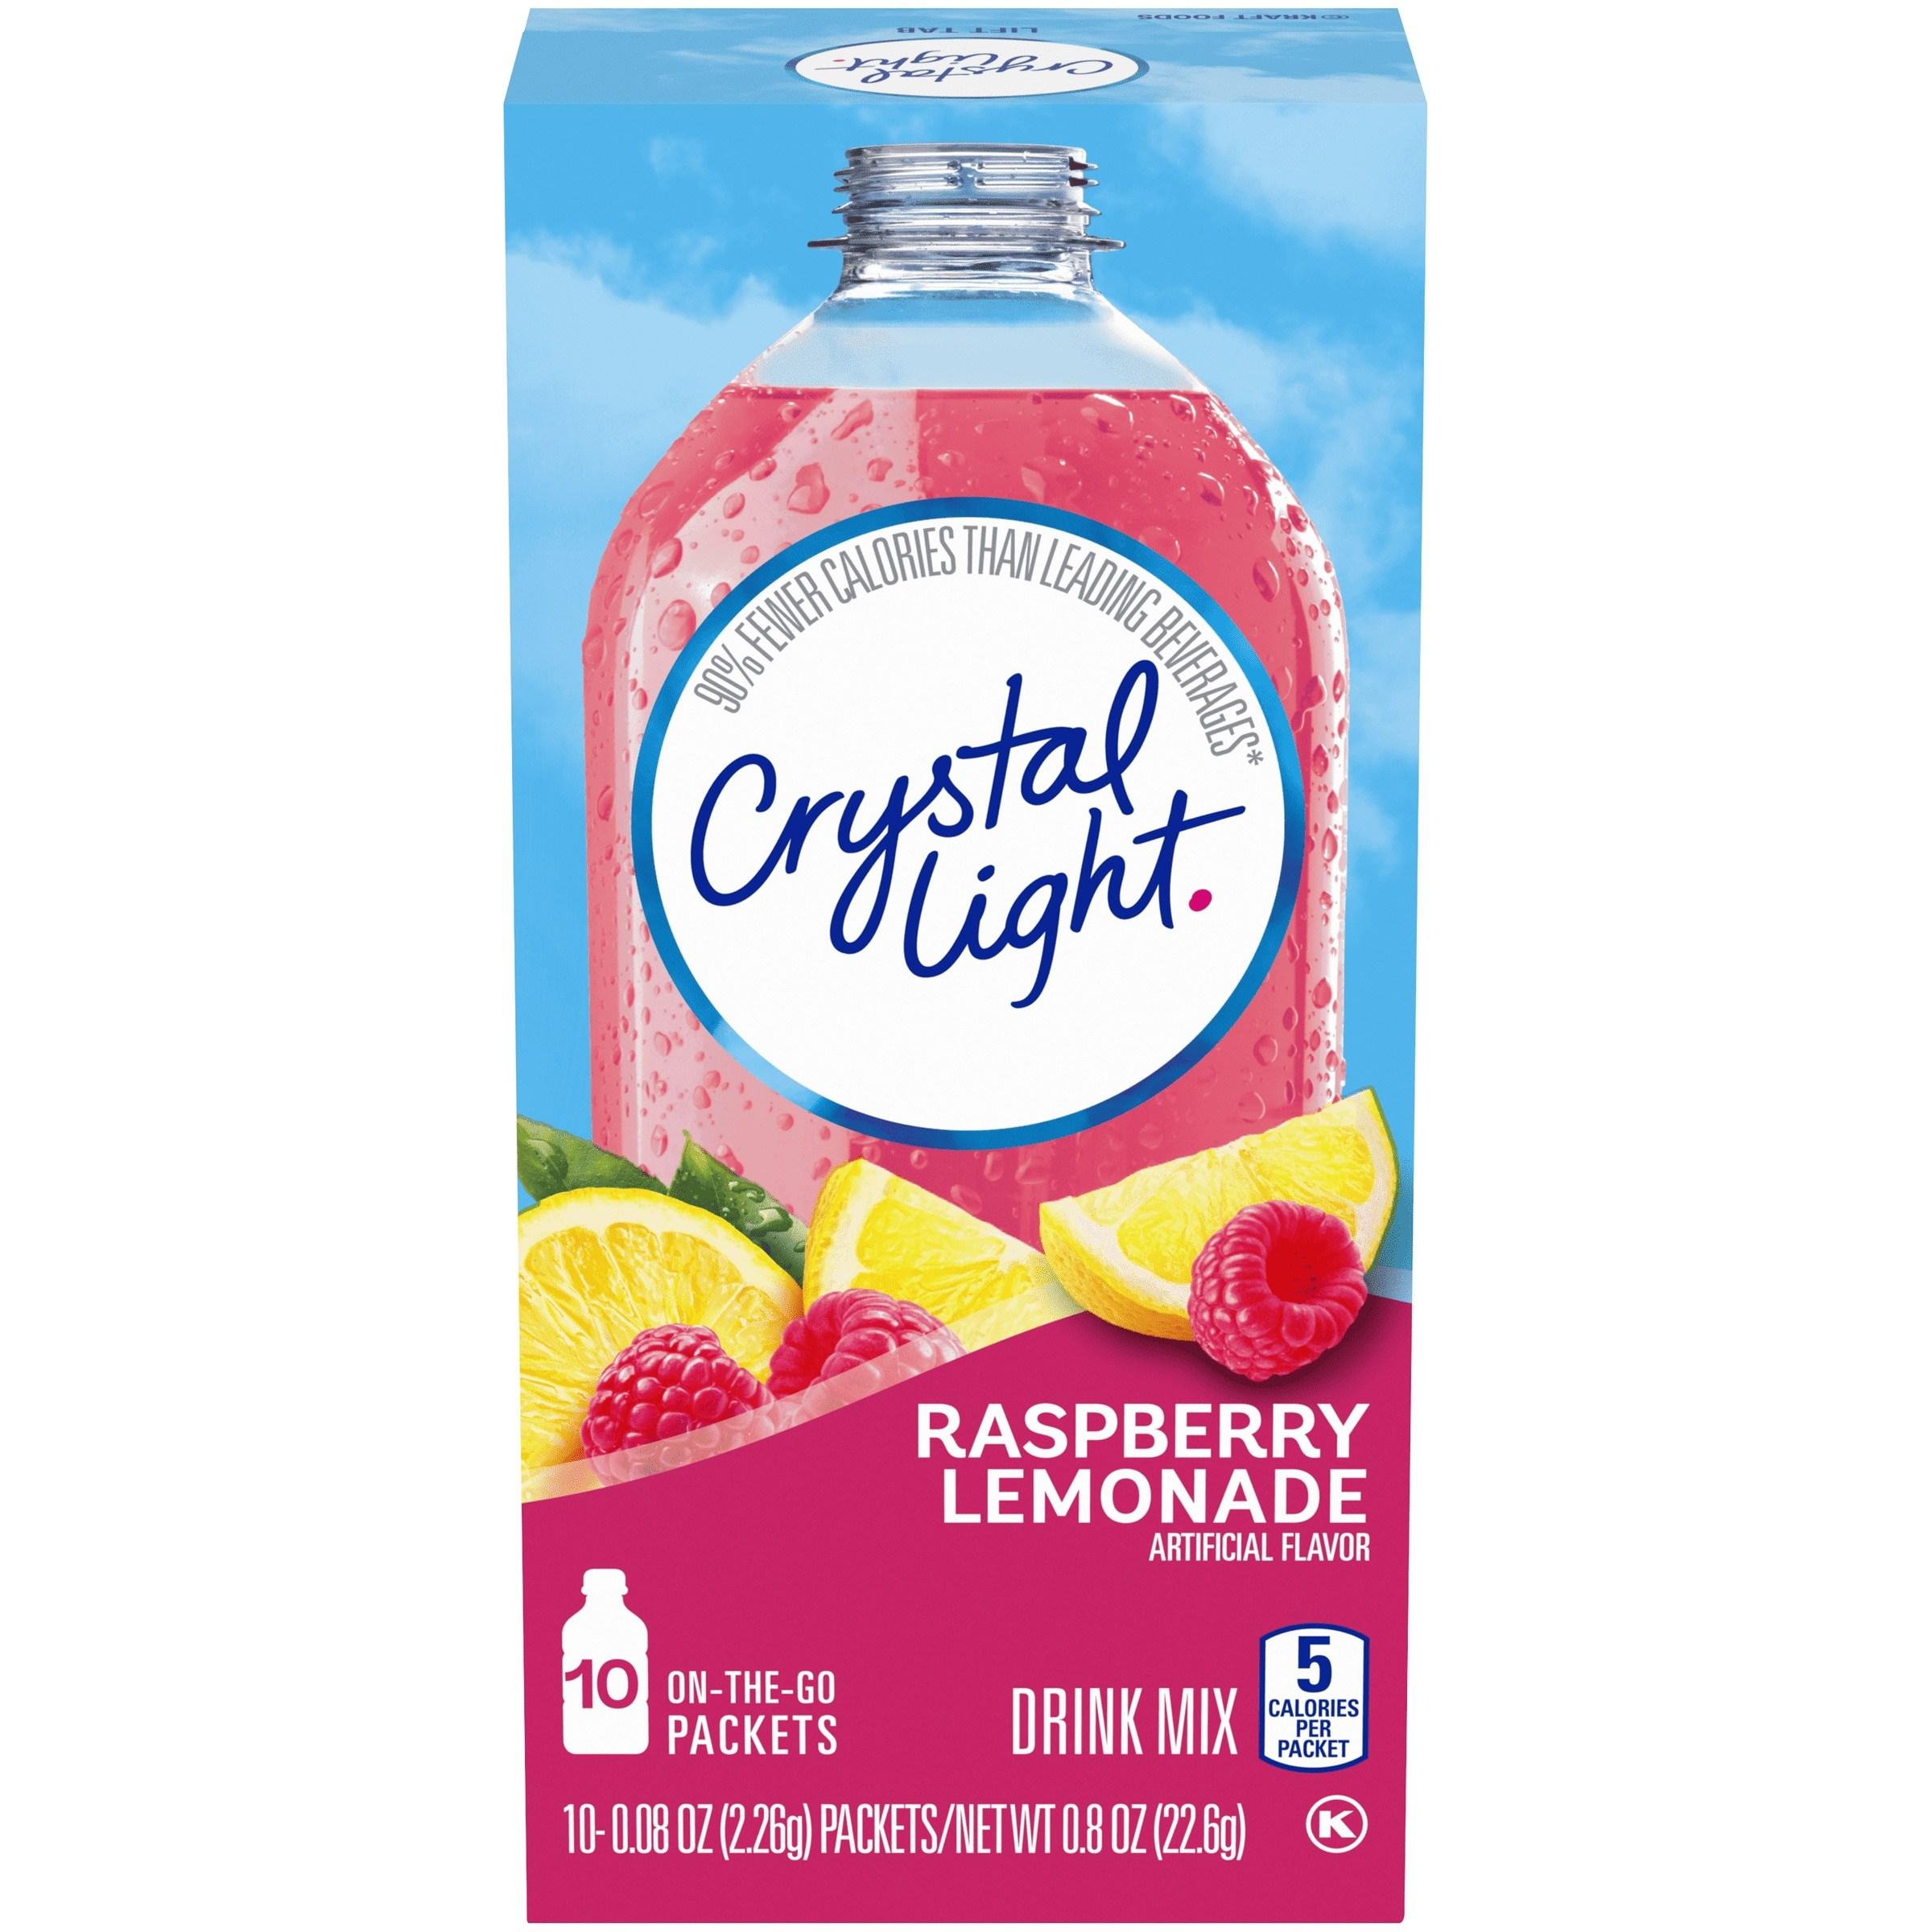 Crystal Light 드링크 믹스 라즈베리 레모네이드 10개입, 22.6g, 1개